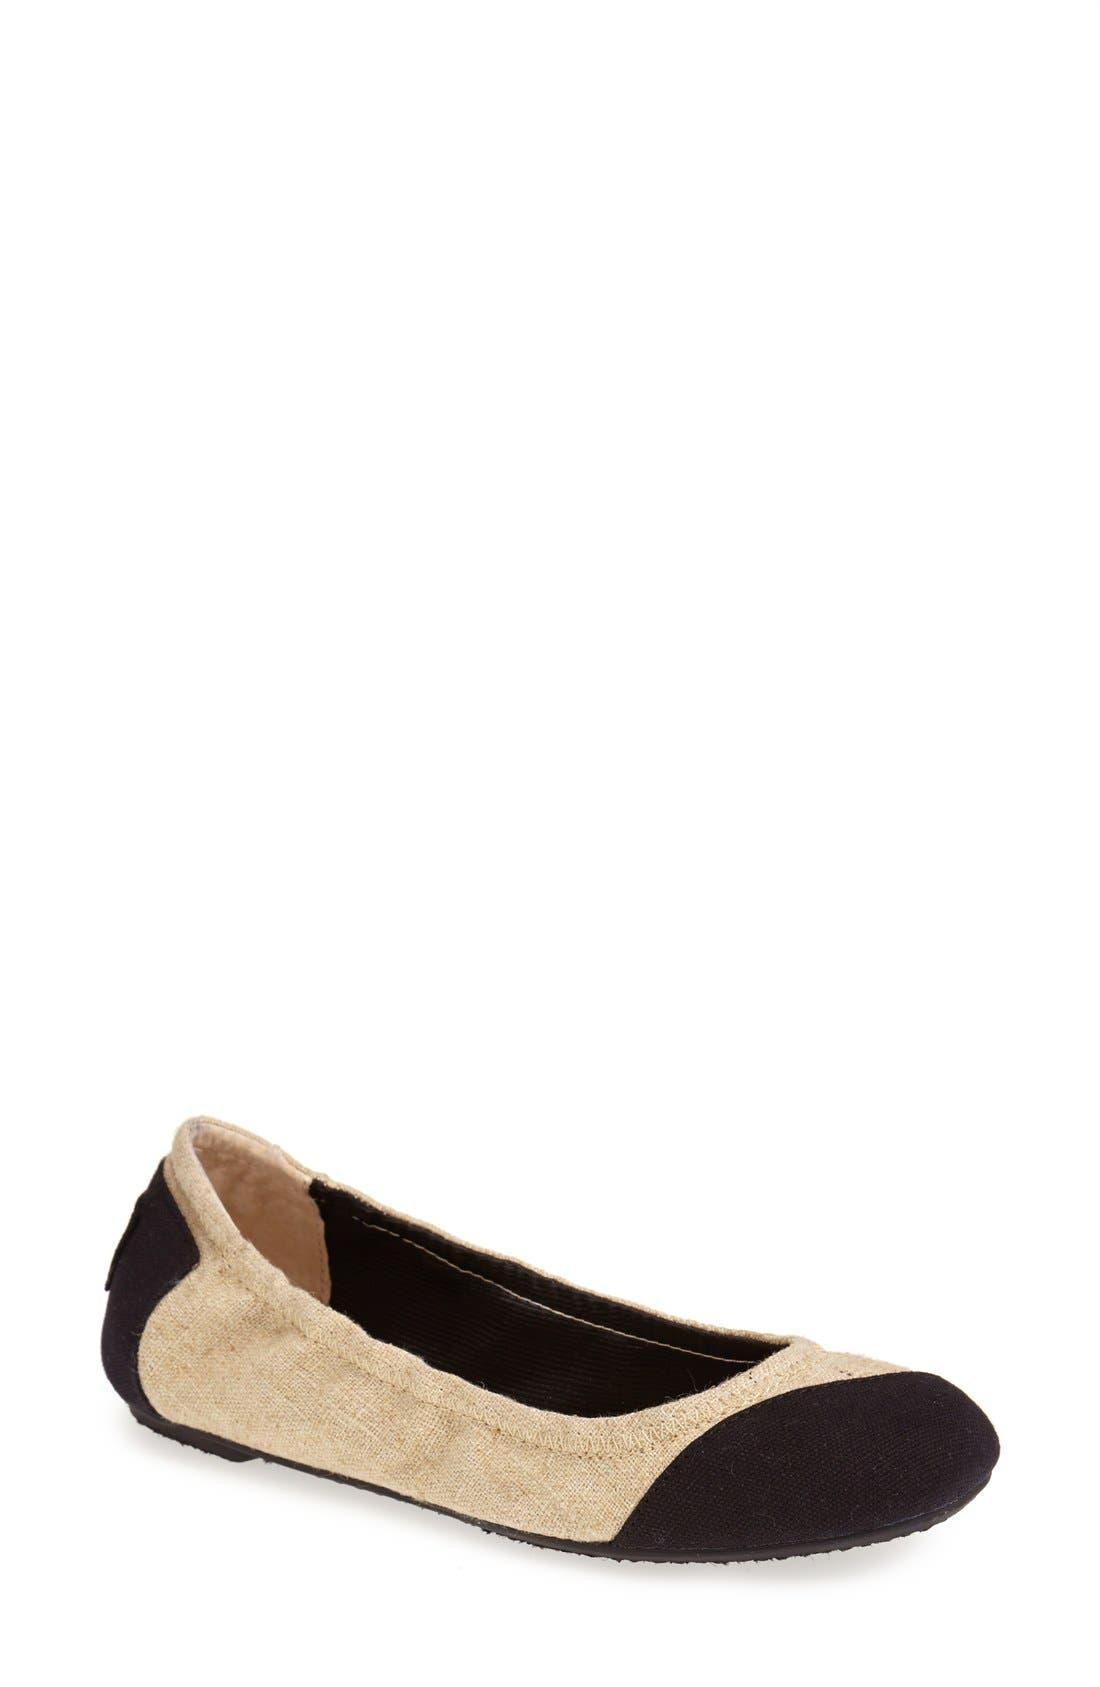 Main Image - TOMS 'Alessandra' Ballet Flat (Women)